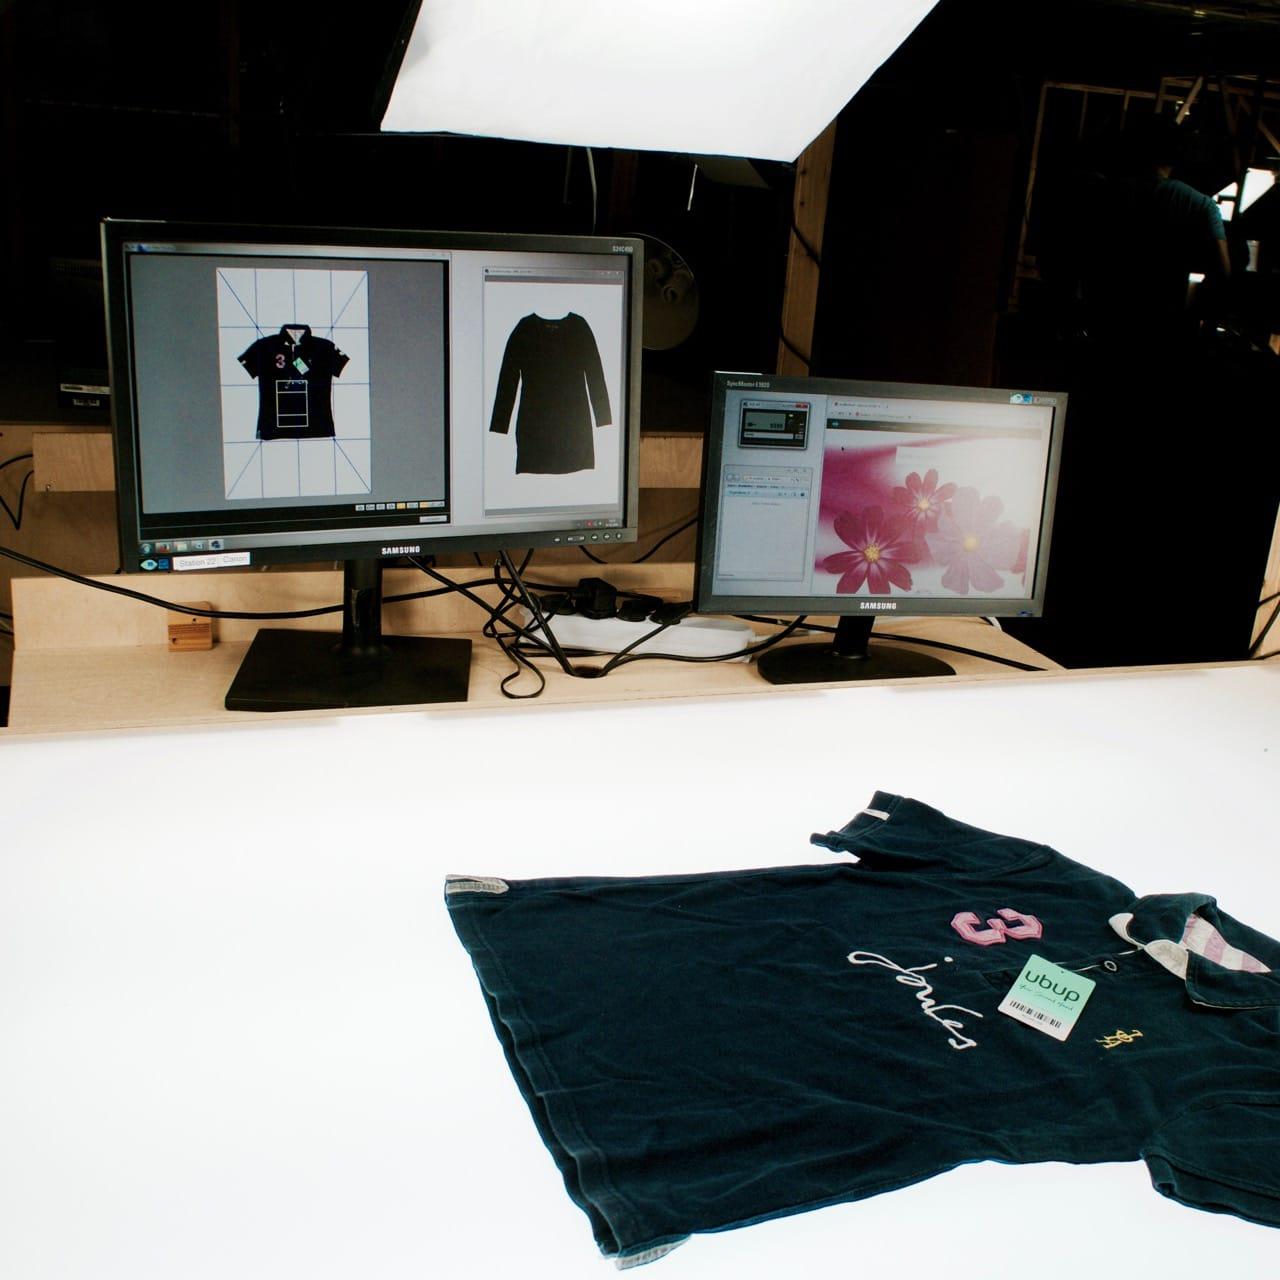 DASISTmomox fashion - Folge mir durch unser Lager 12